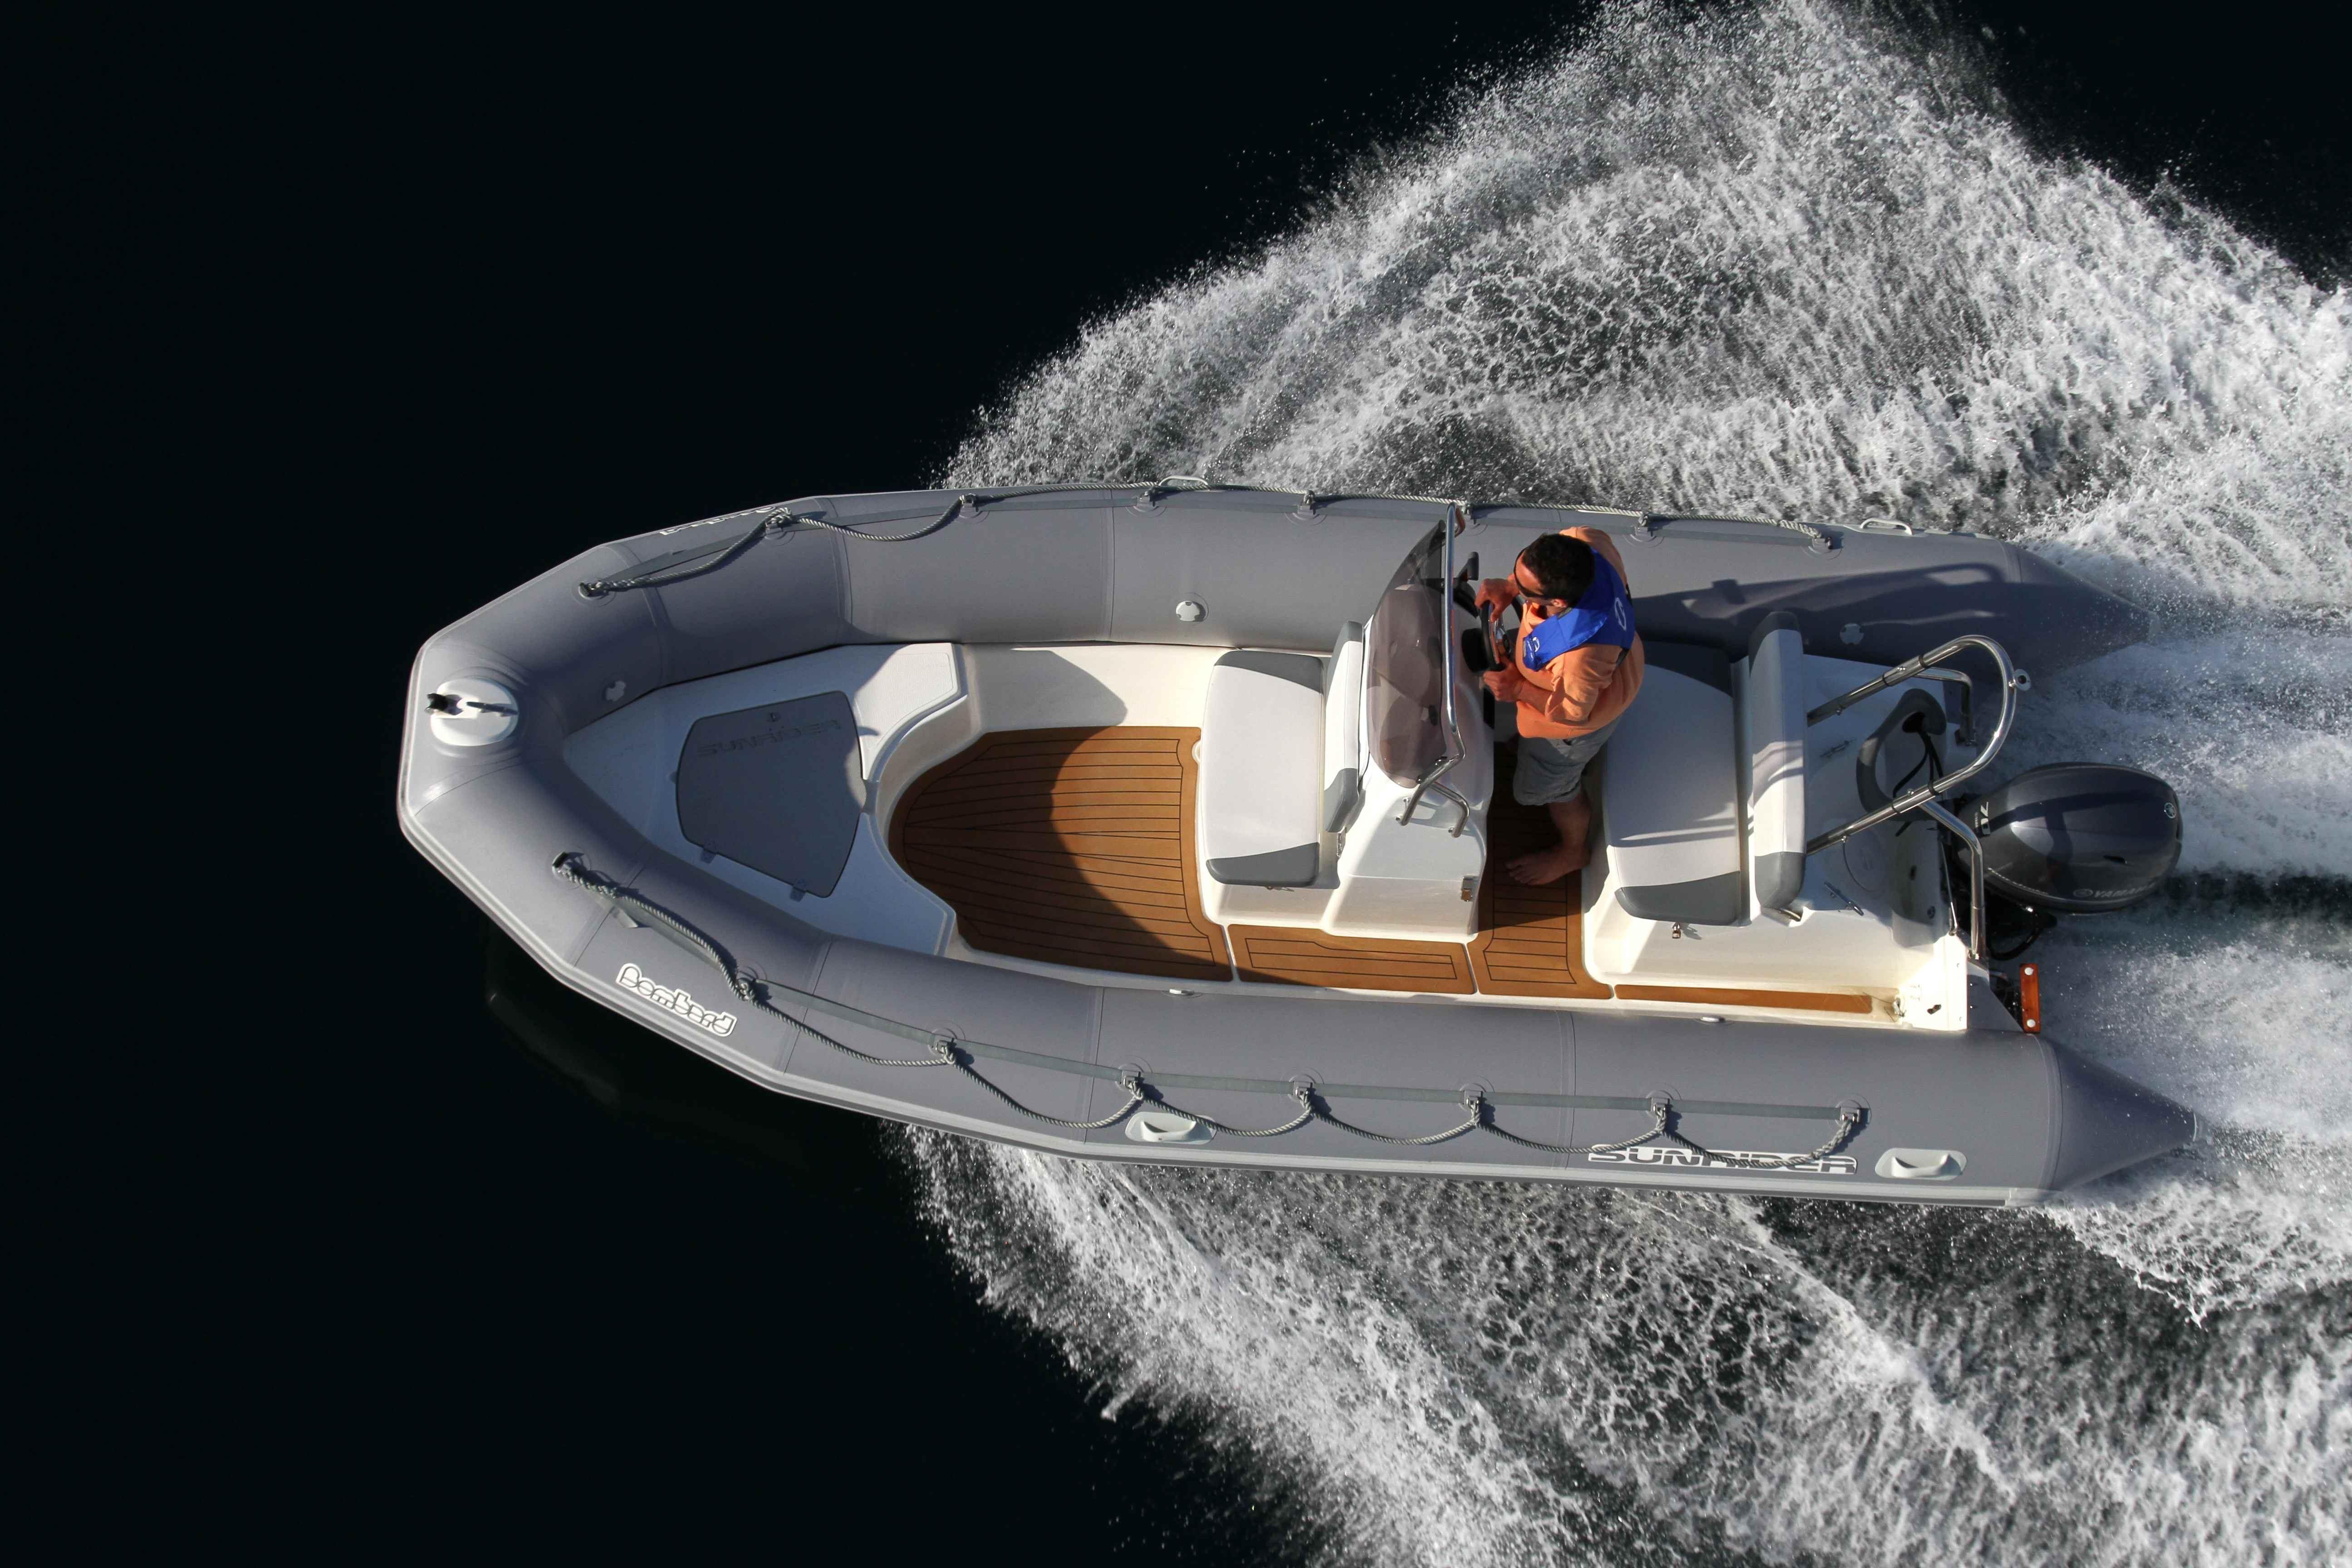 BOMBARD 550 - 28 900 €